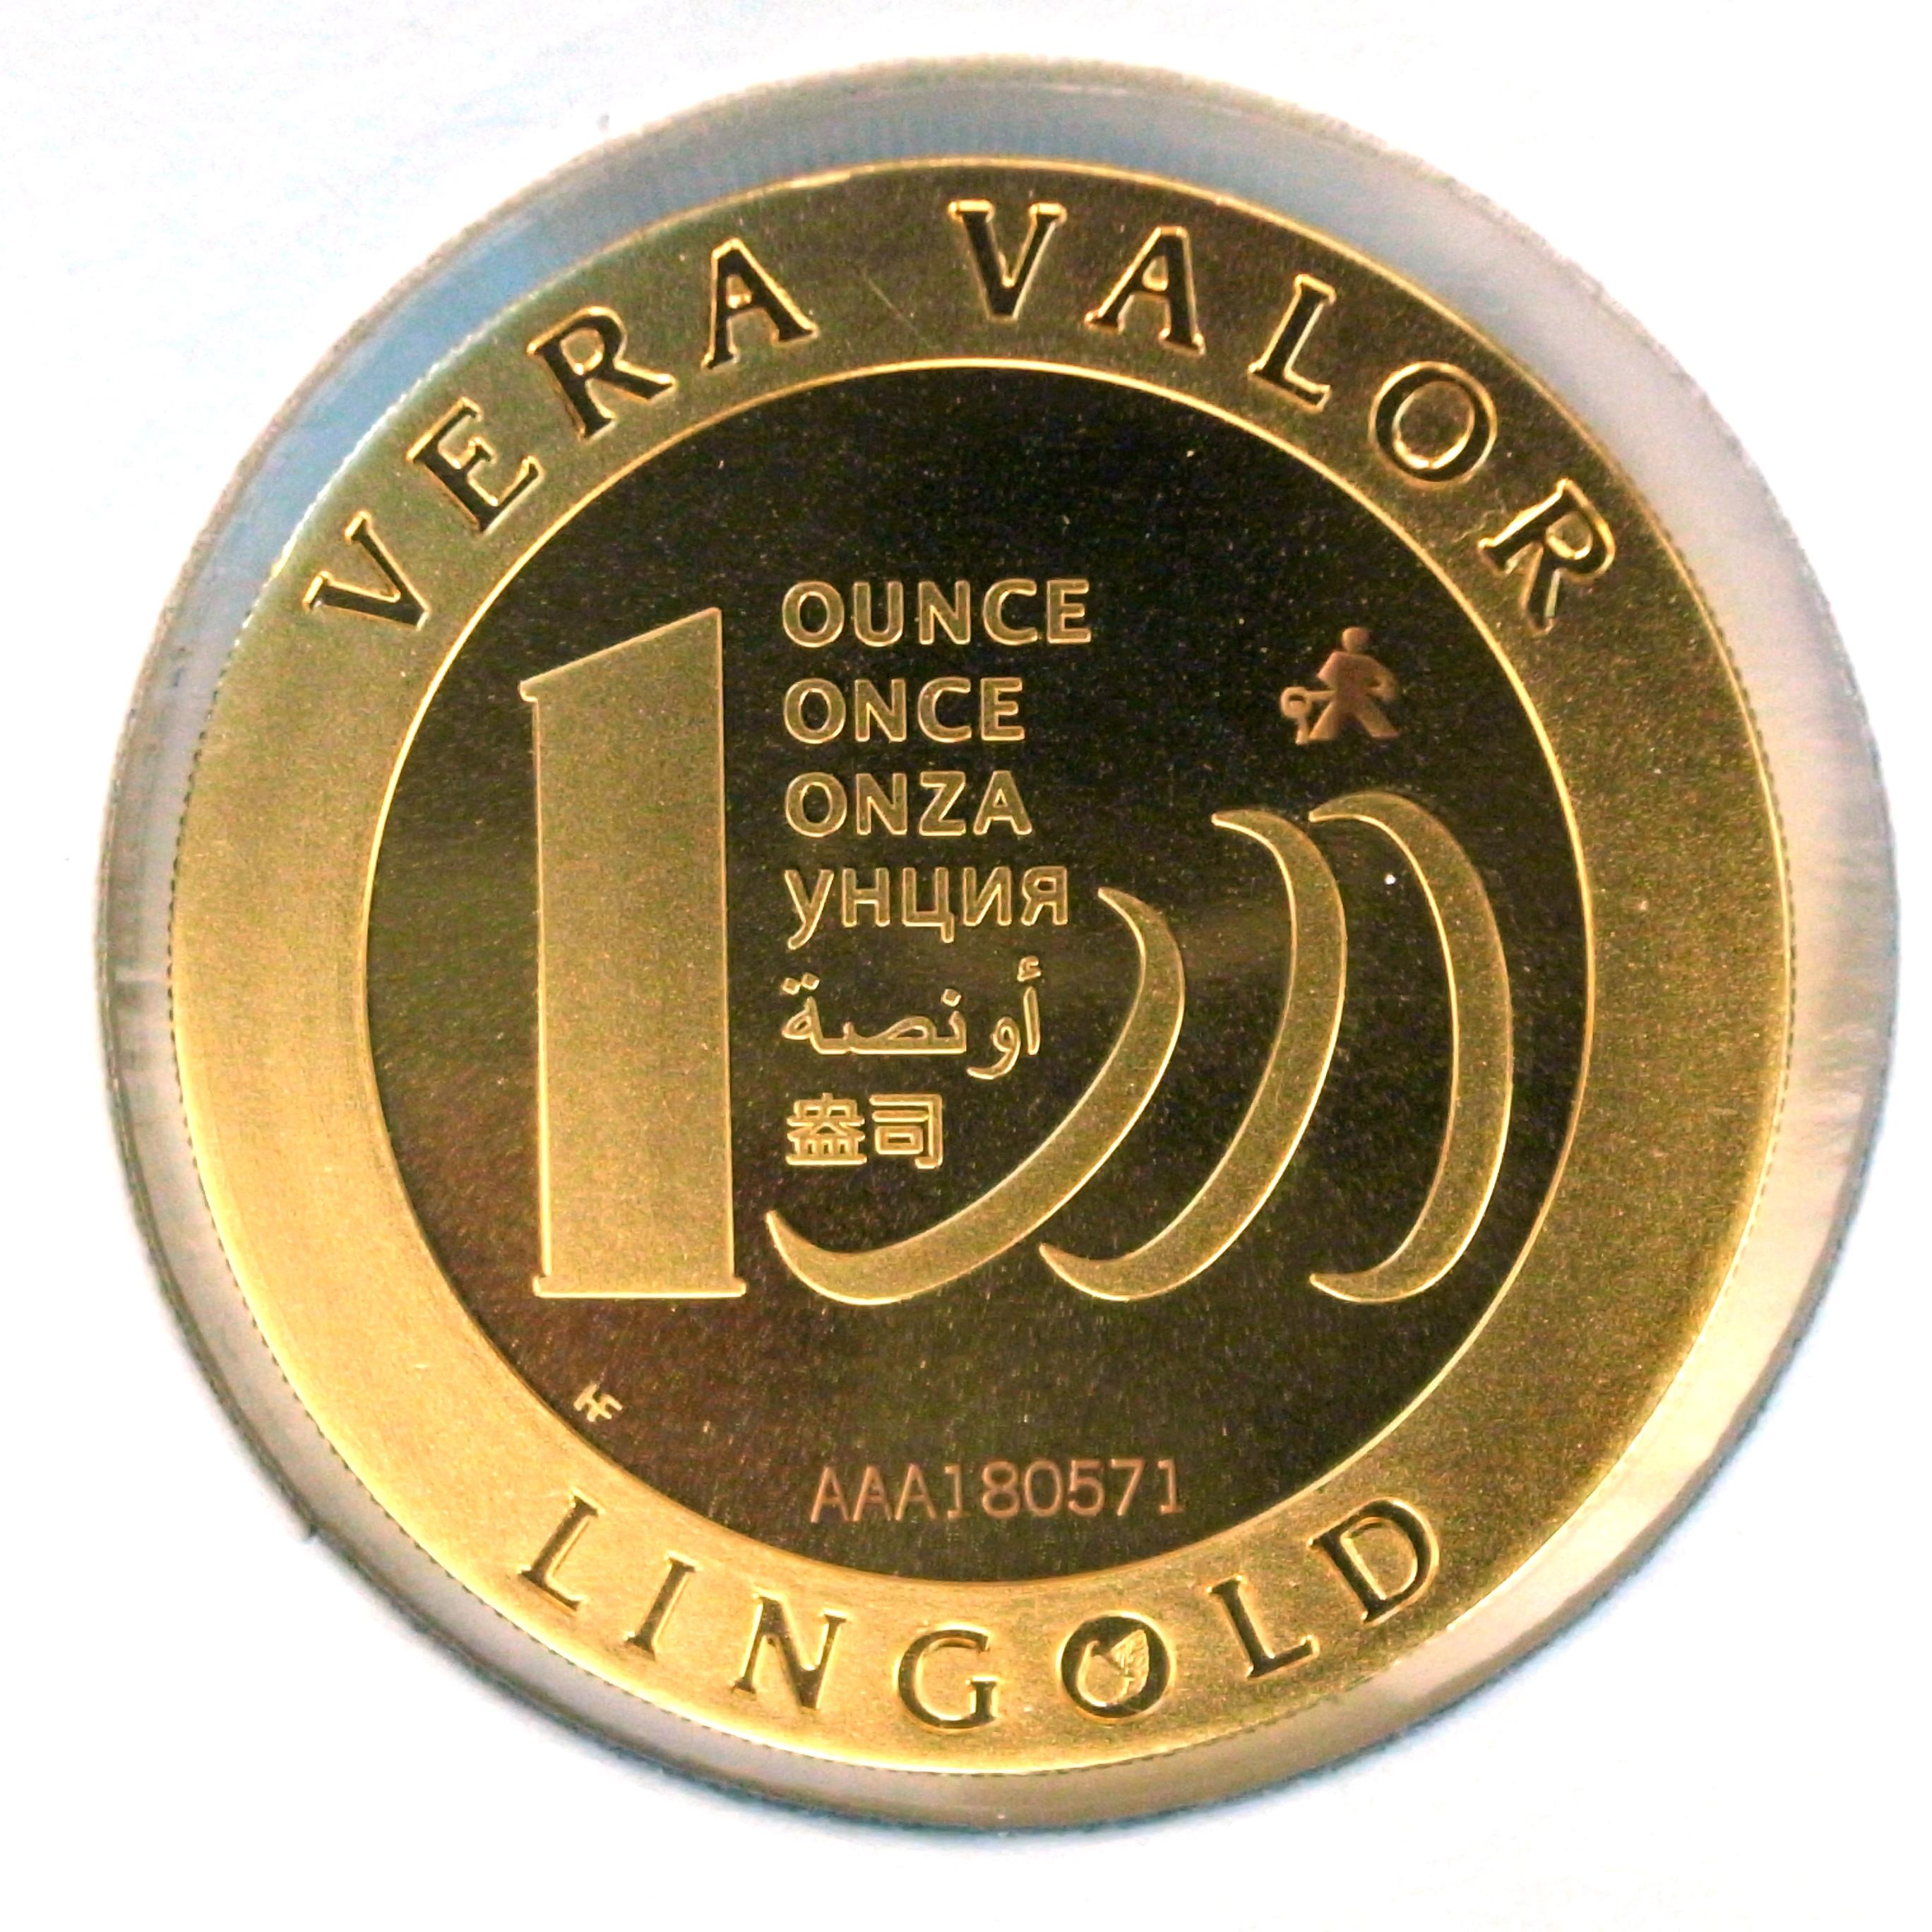 Réf. 180571 Vera Valor 1 once (LSP)  2018 - 6 langues- 2eme type - AVERS